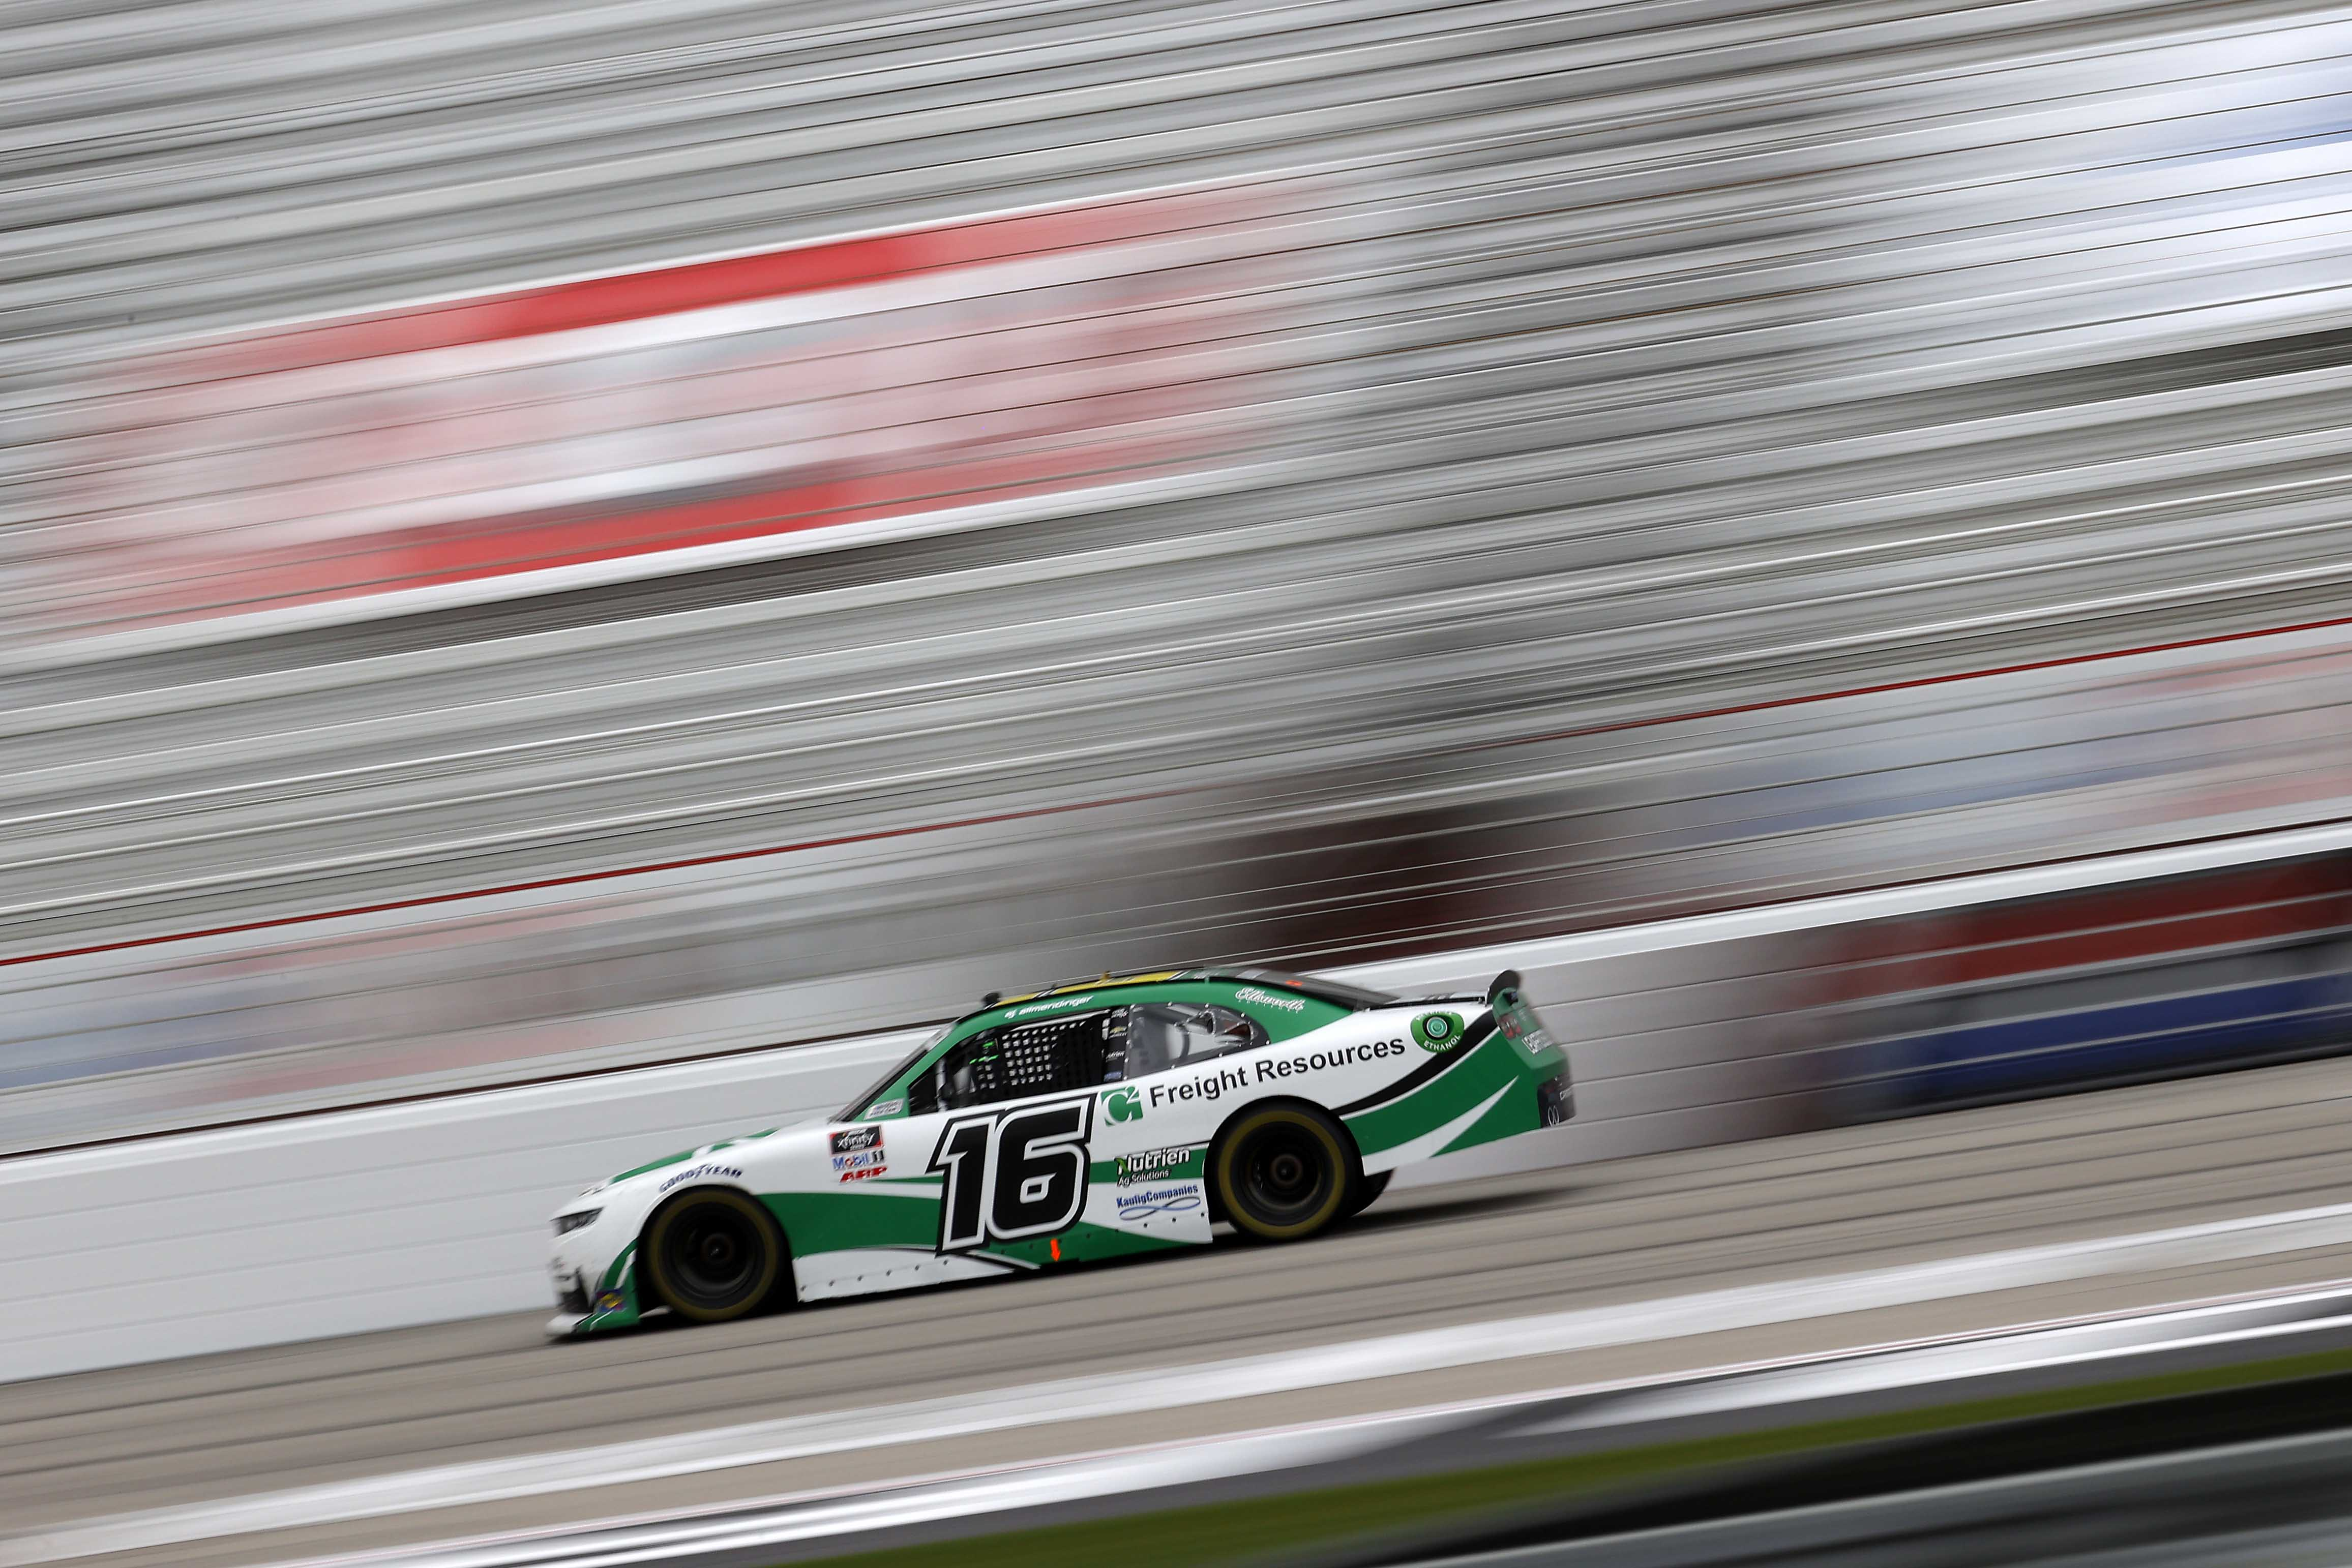 AJ Allmendinger at Atlanta Motor Speedway - NASCAR Xfinity Series